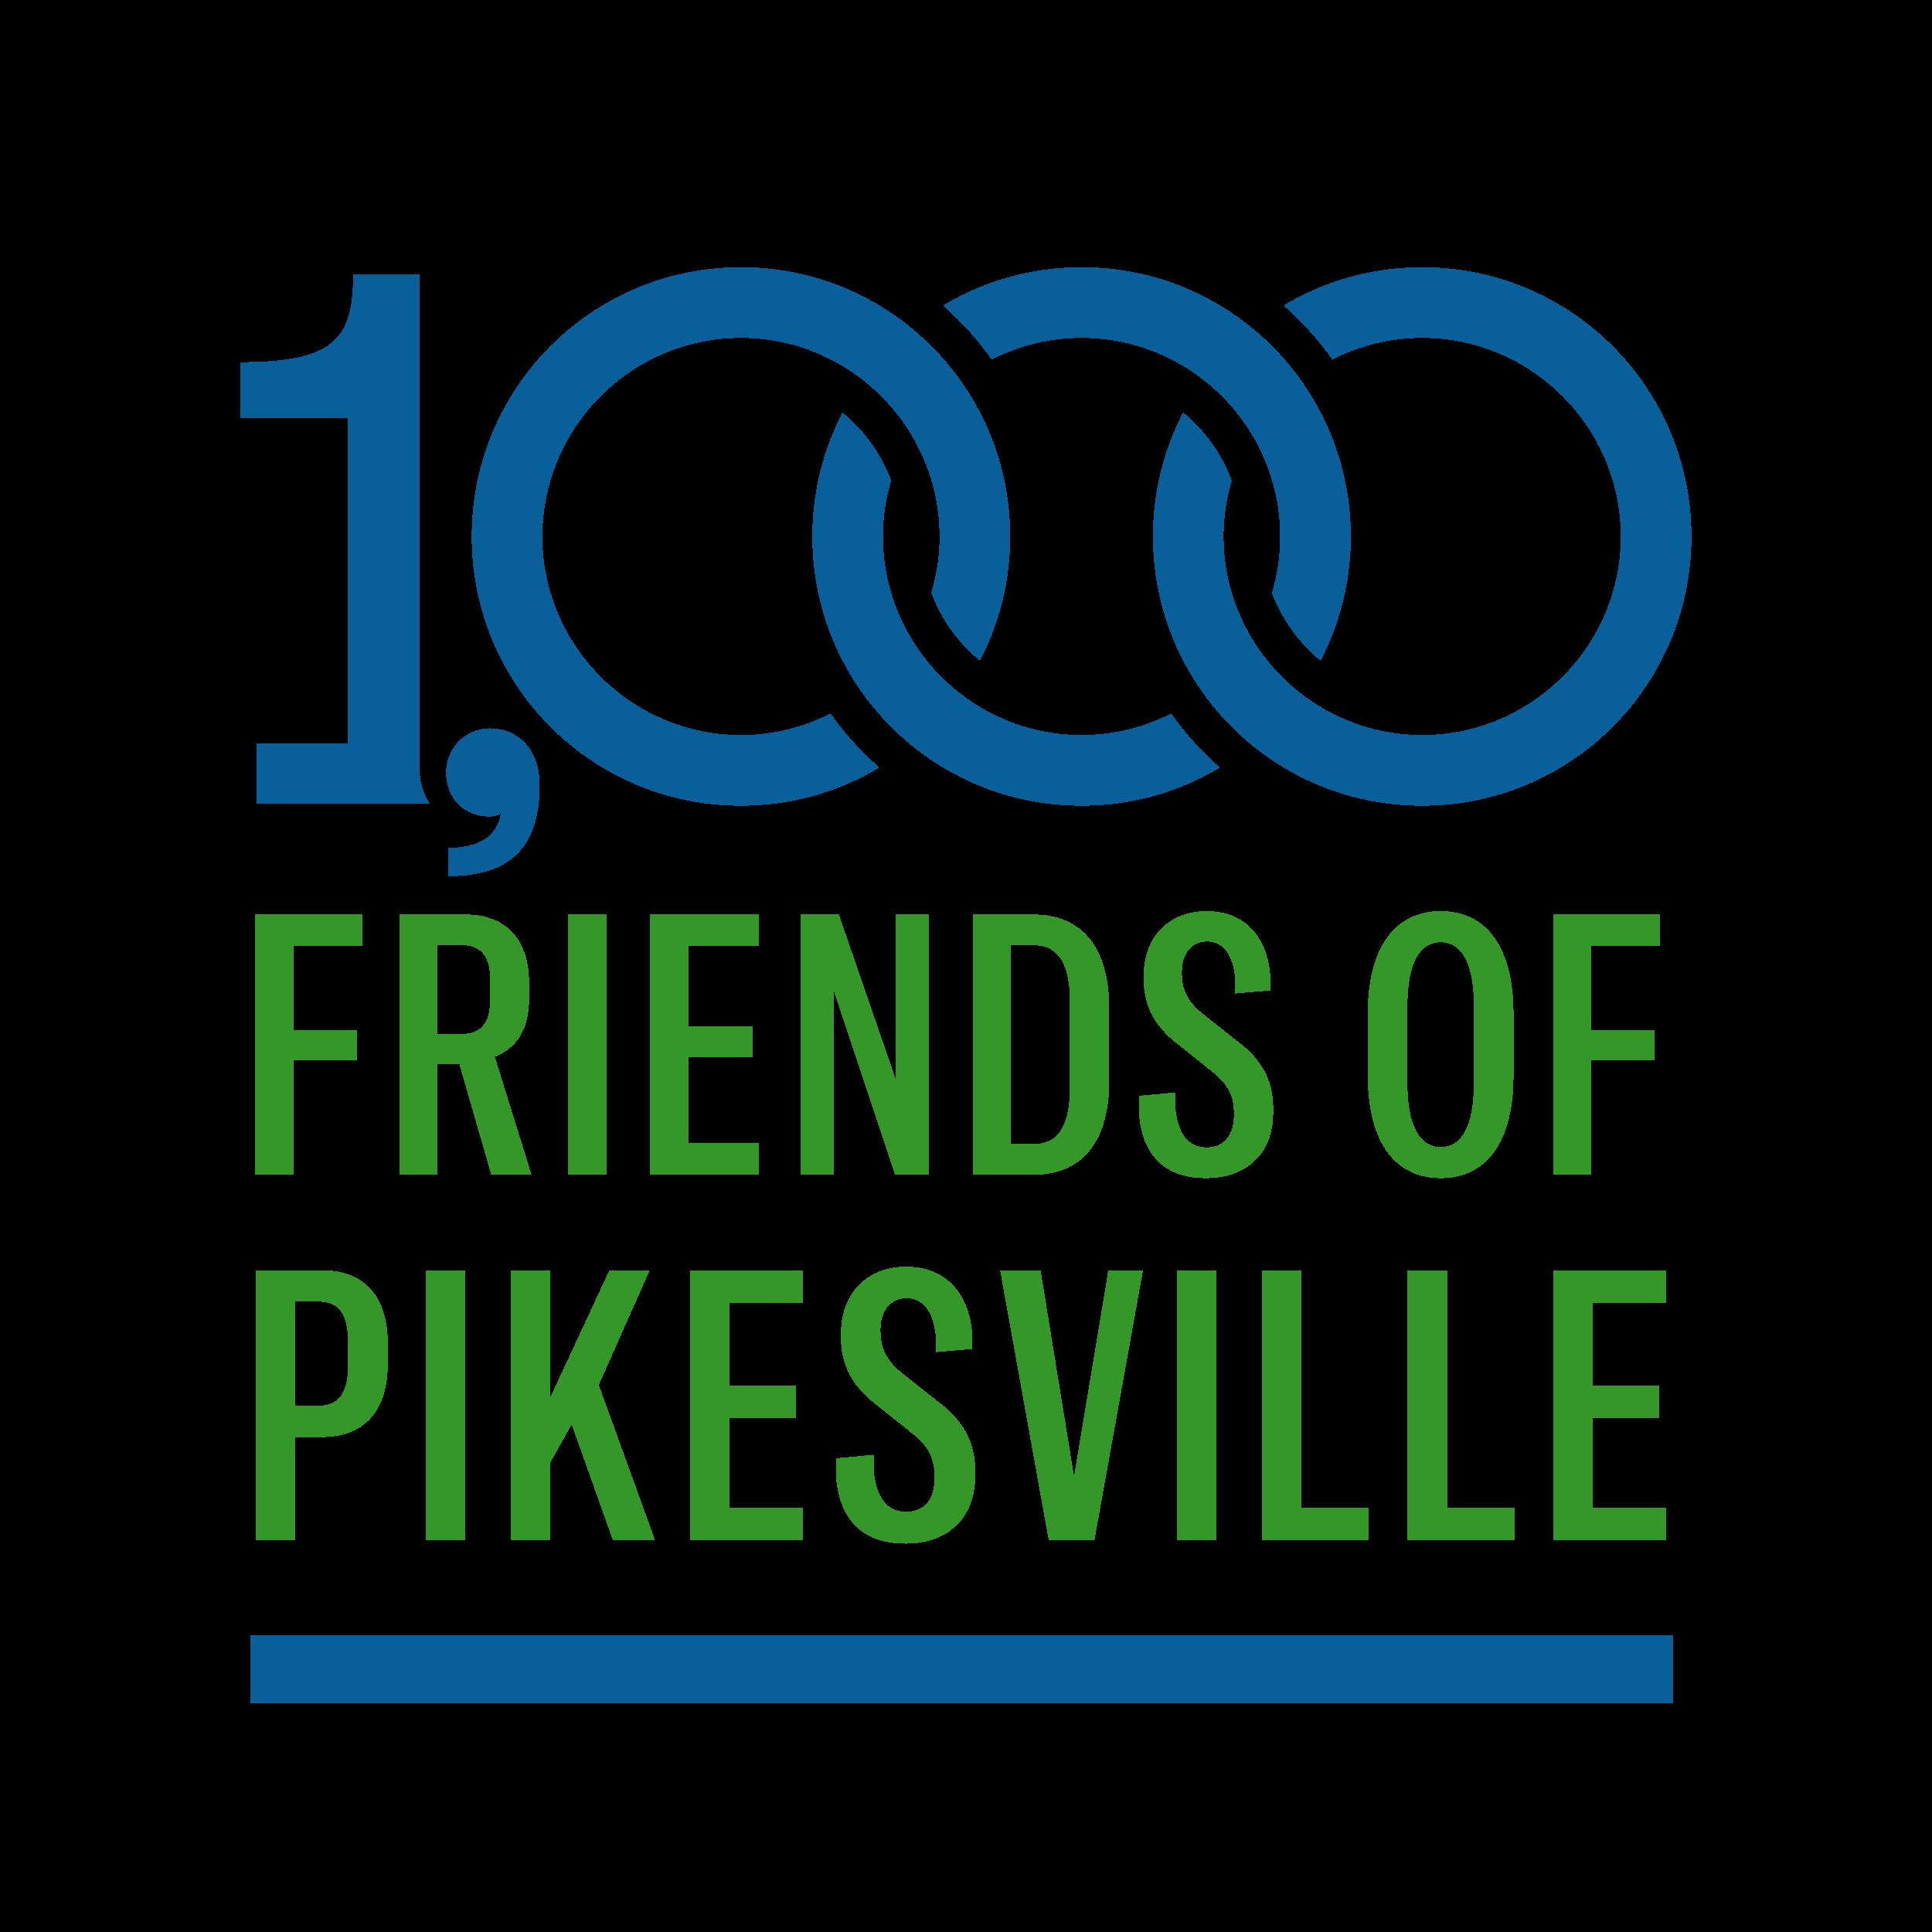 https://growthzonesitesprod.azureedge.net/wp-content/uploads/sites/803/2020/10/1000_Friends_of_Pikesville_logo.png